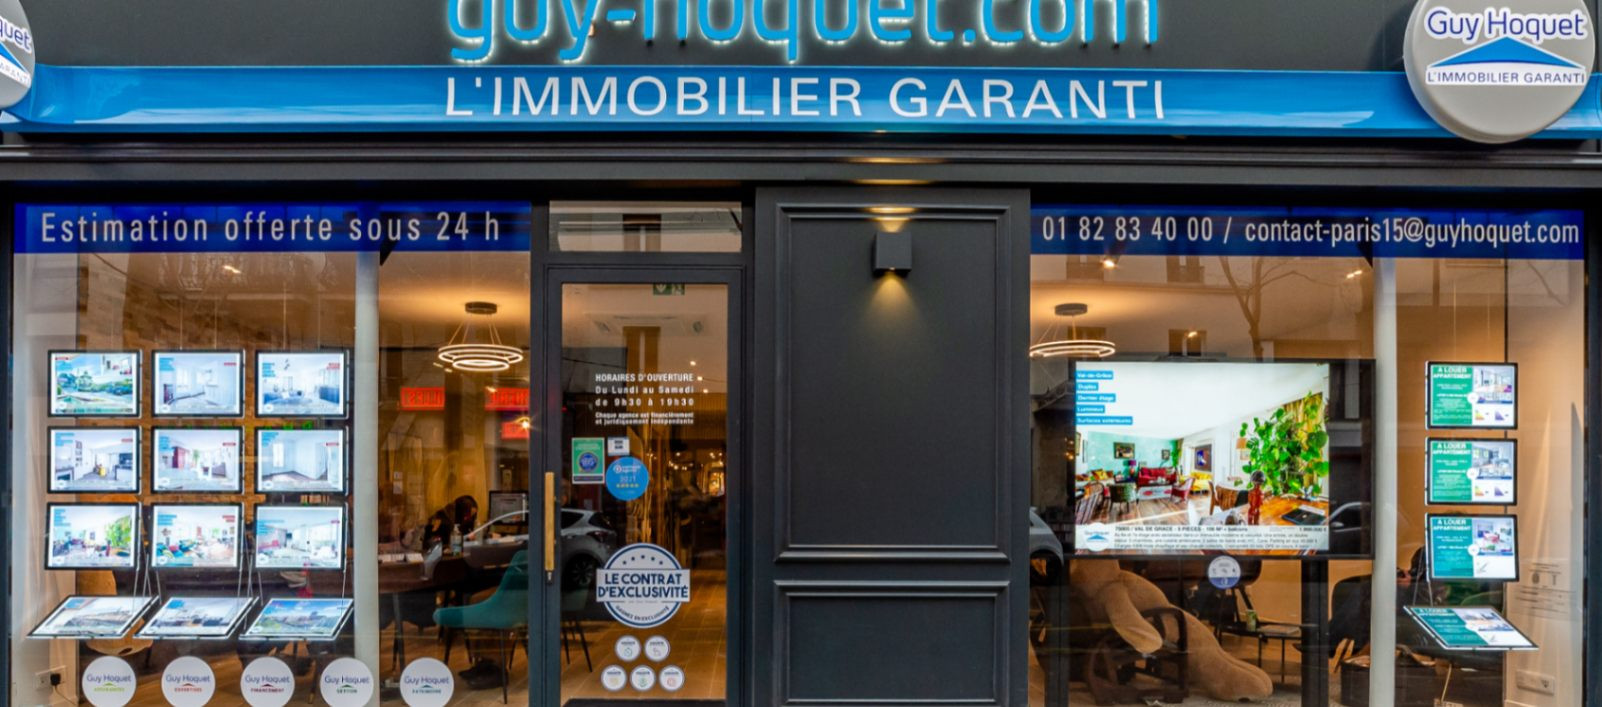 Agence Guy Hoquet PARIS 15 Saint Charles